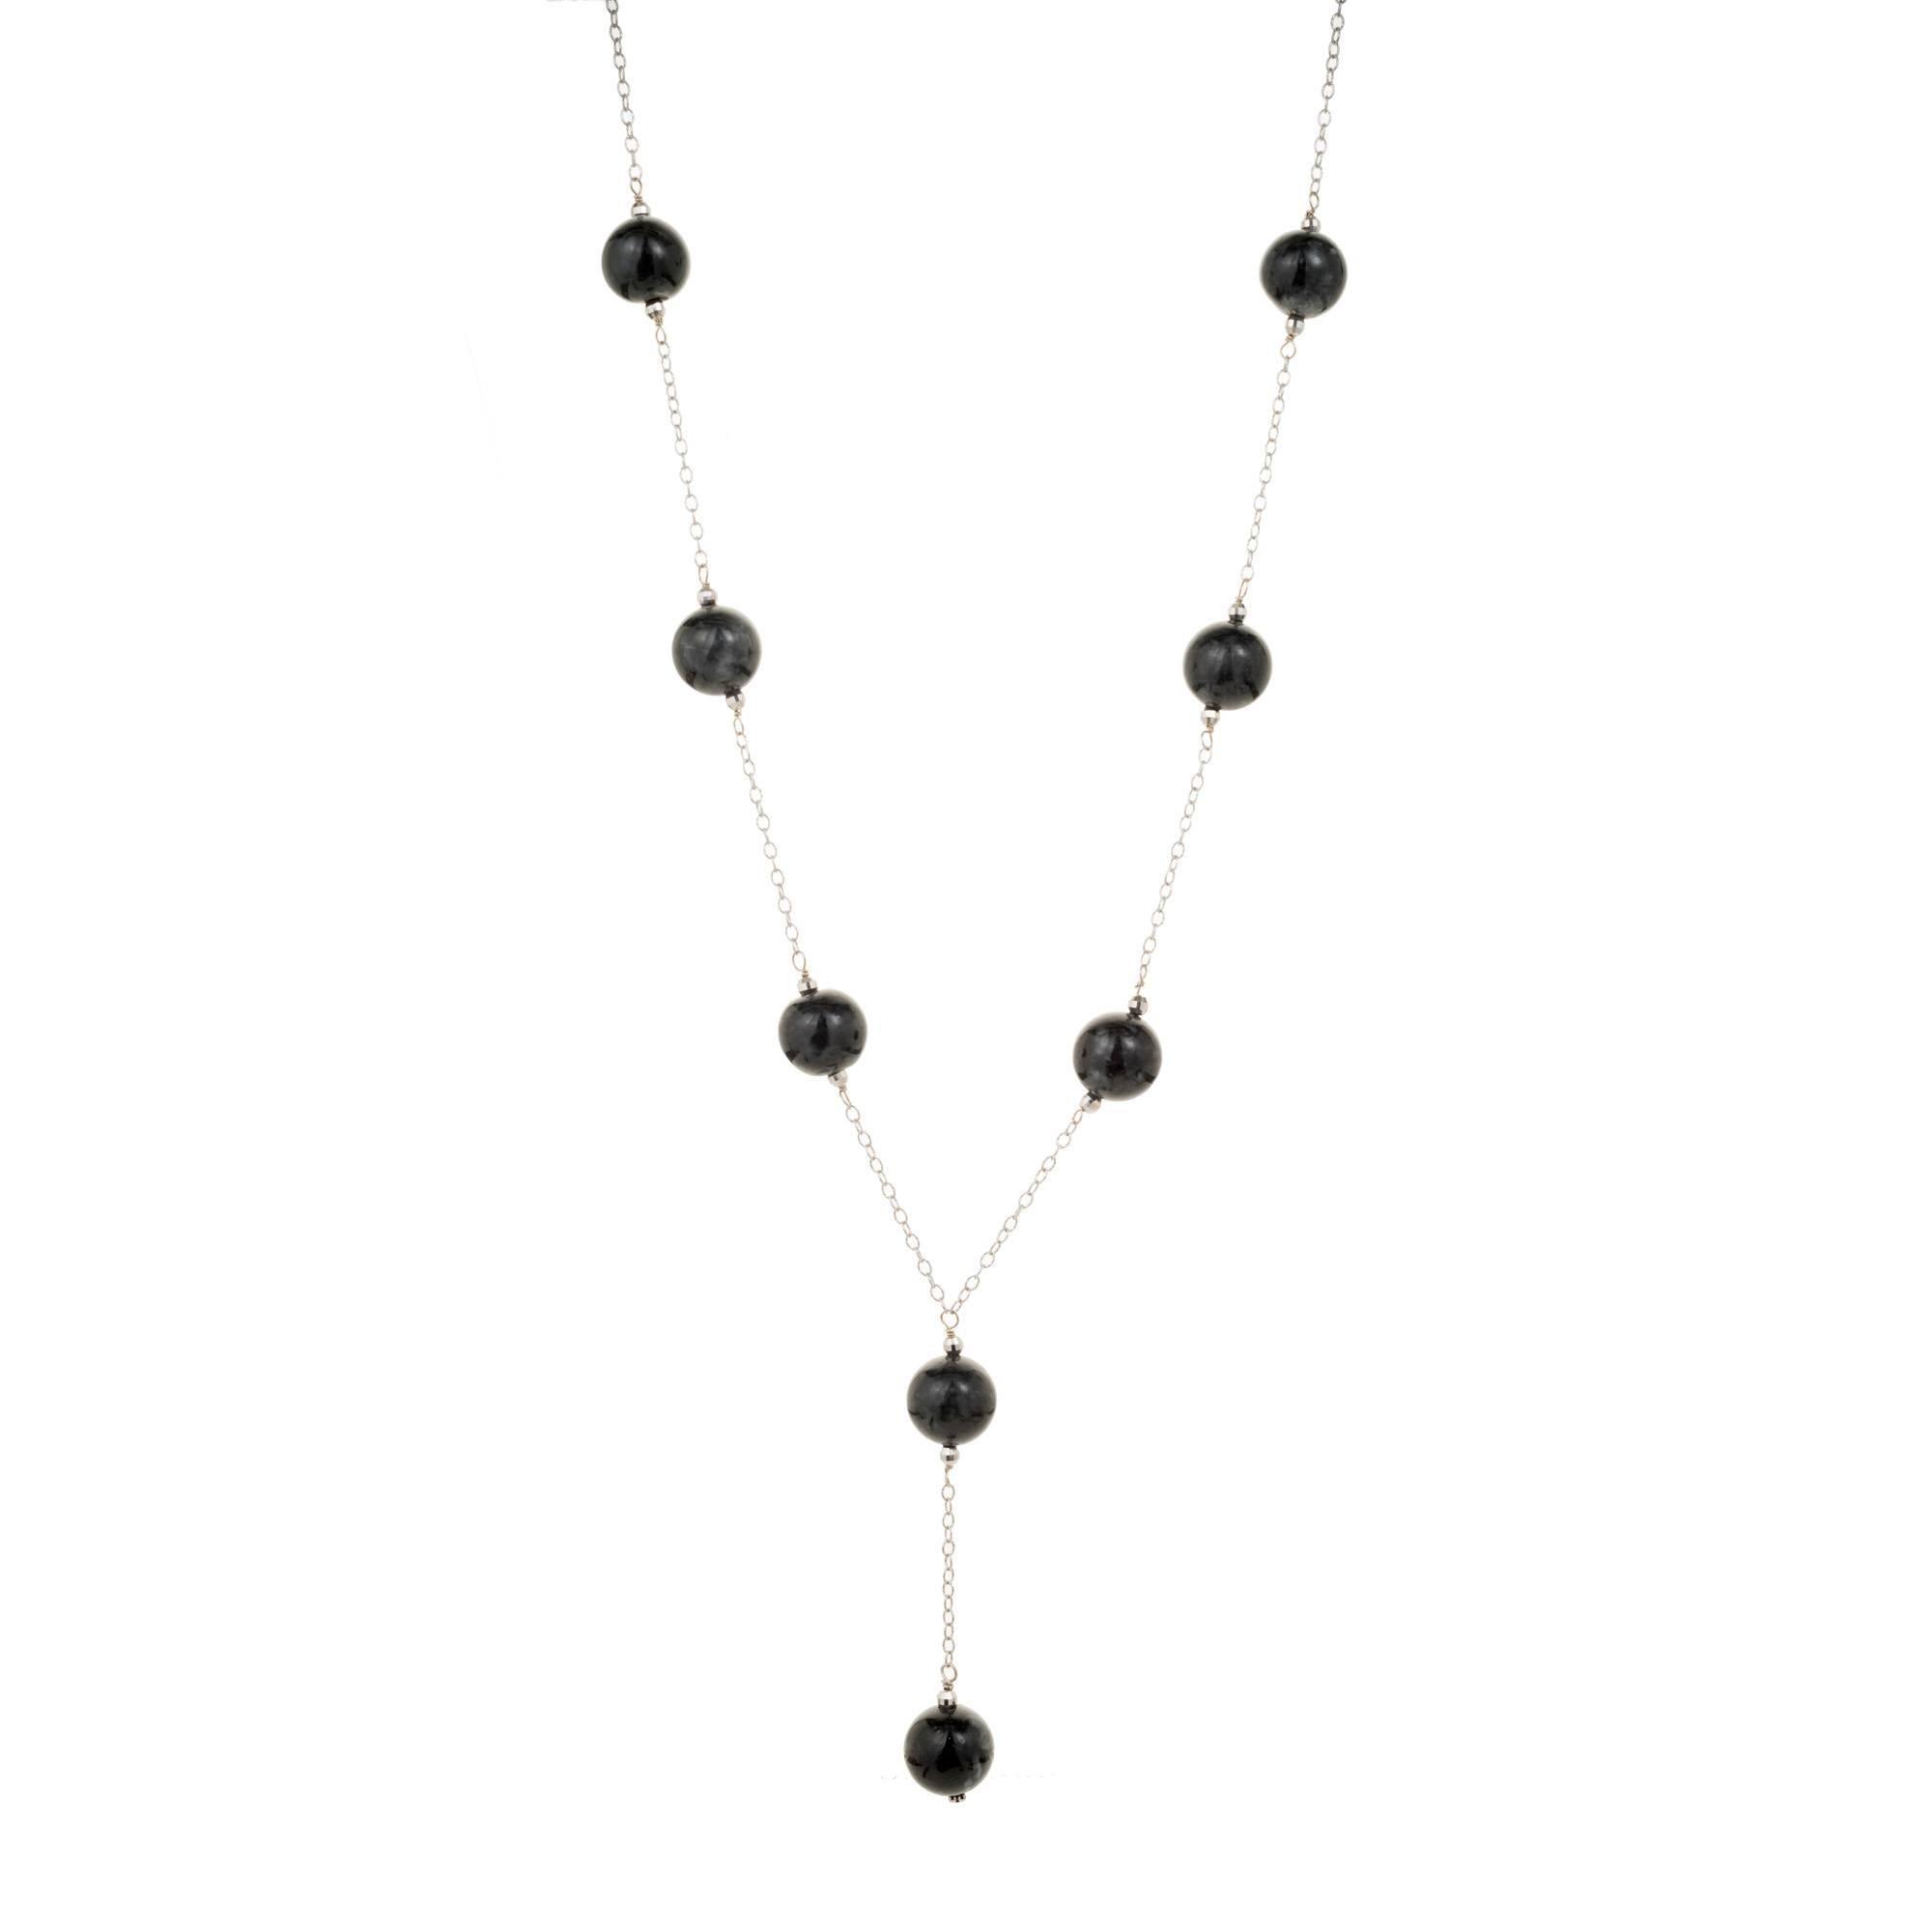 GIA Certified Natural Black Jadeite Jade Bead Gold Necklace